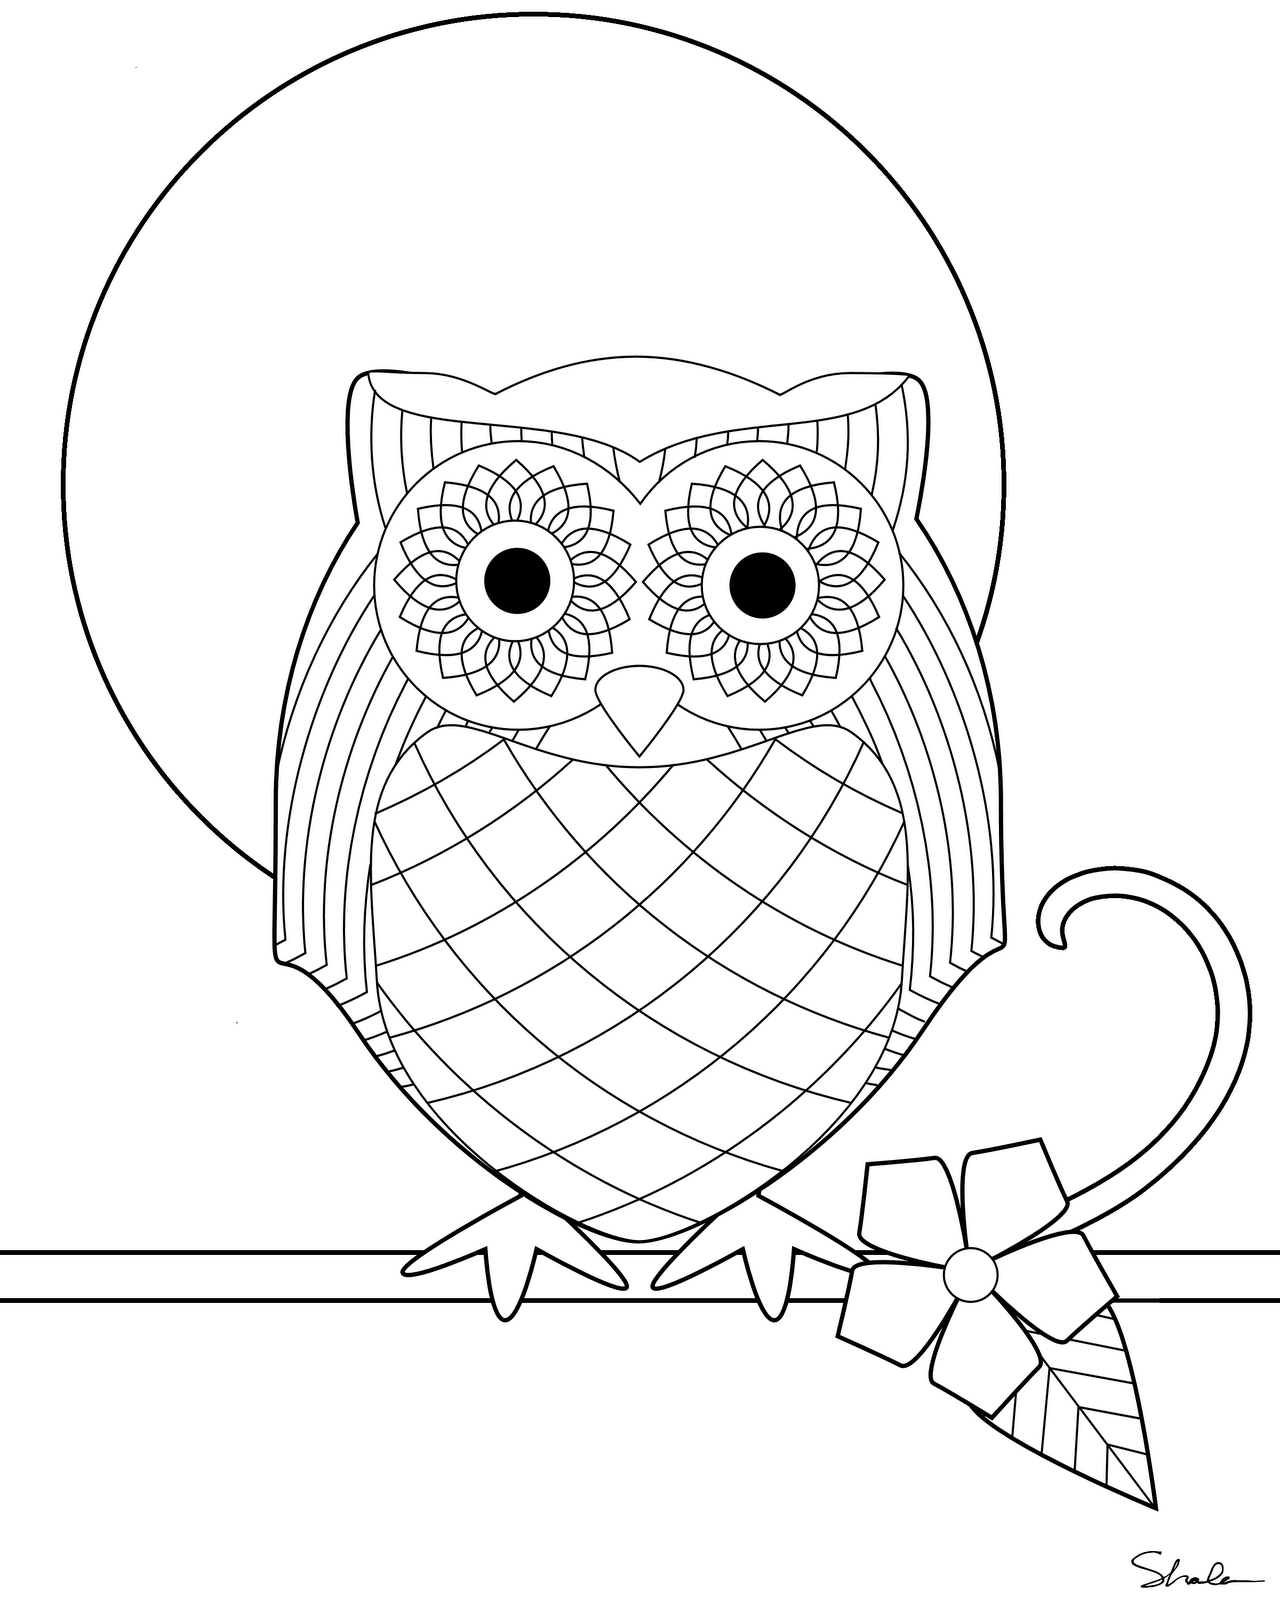 owl coloring pages to print printable animal owl coloring sheets for kindergarten coloring pages to print owl